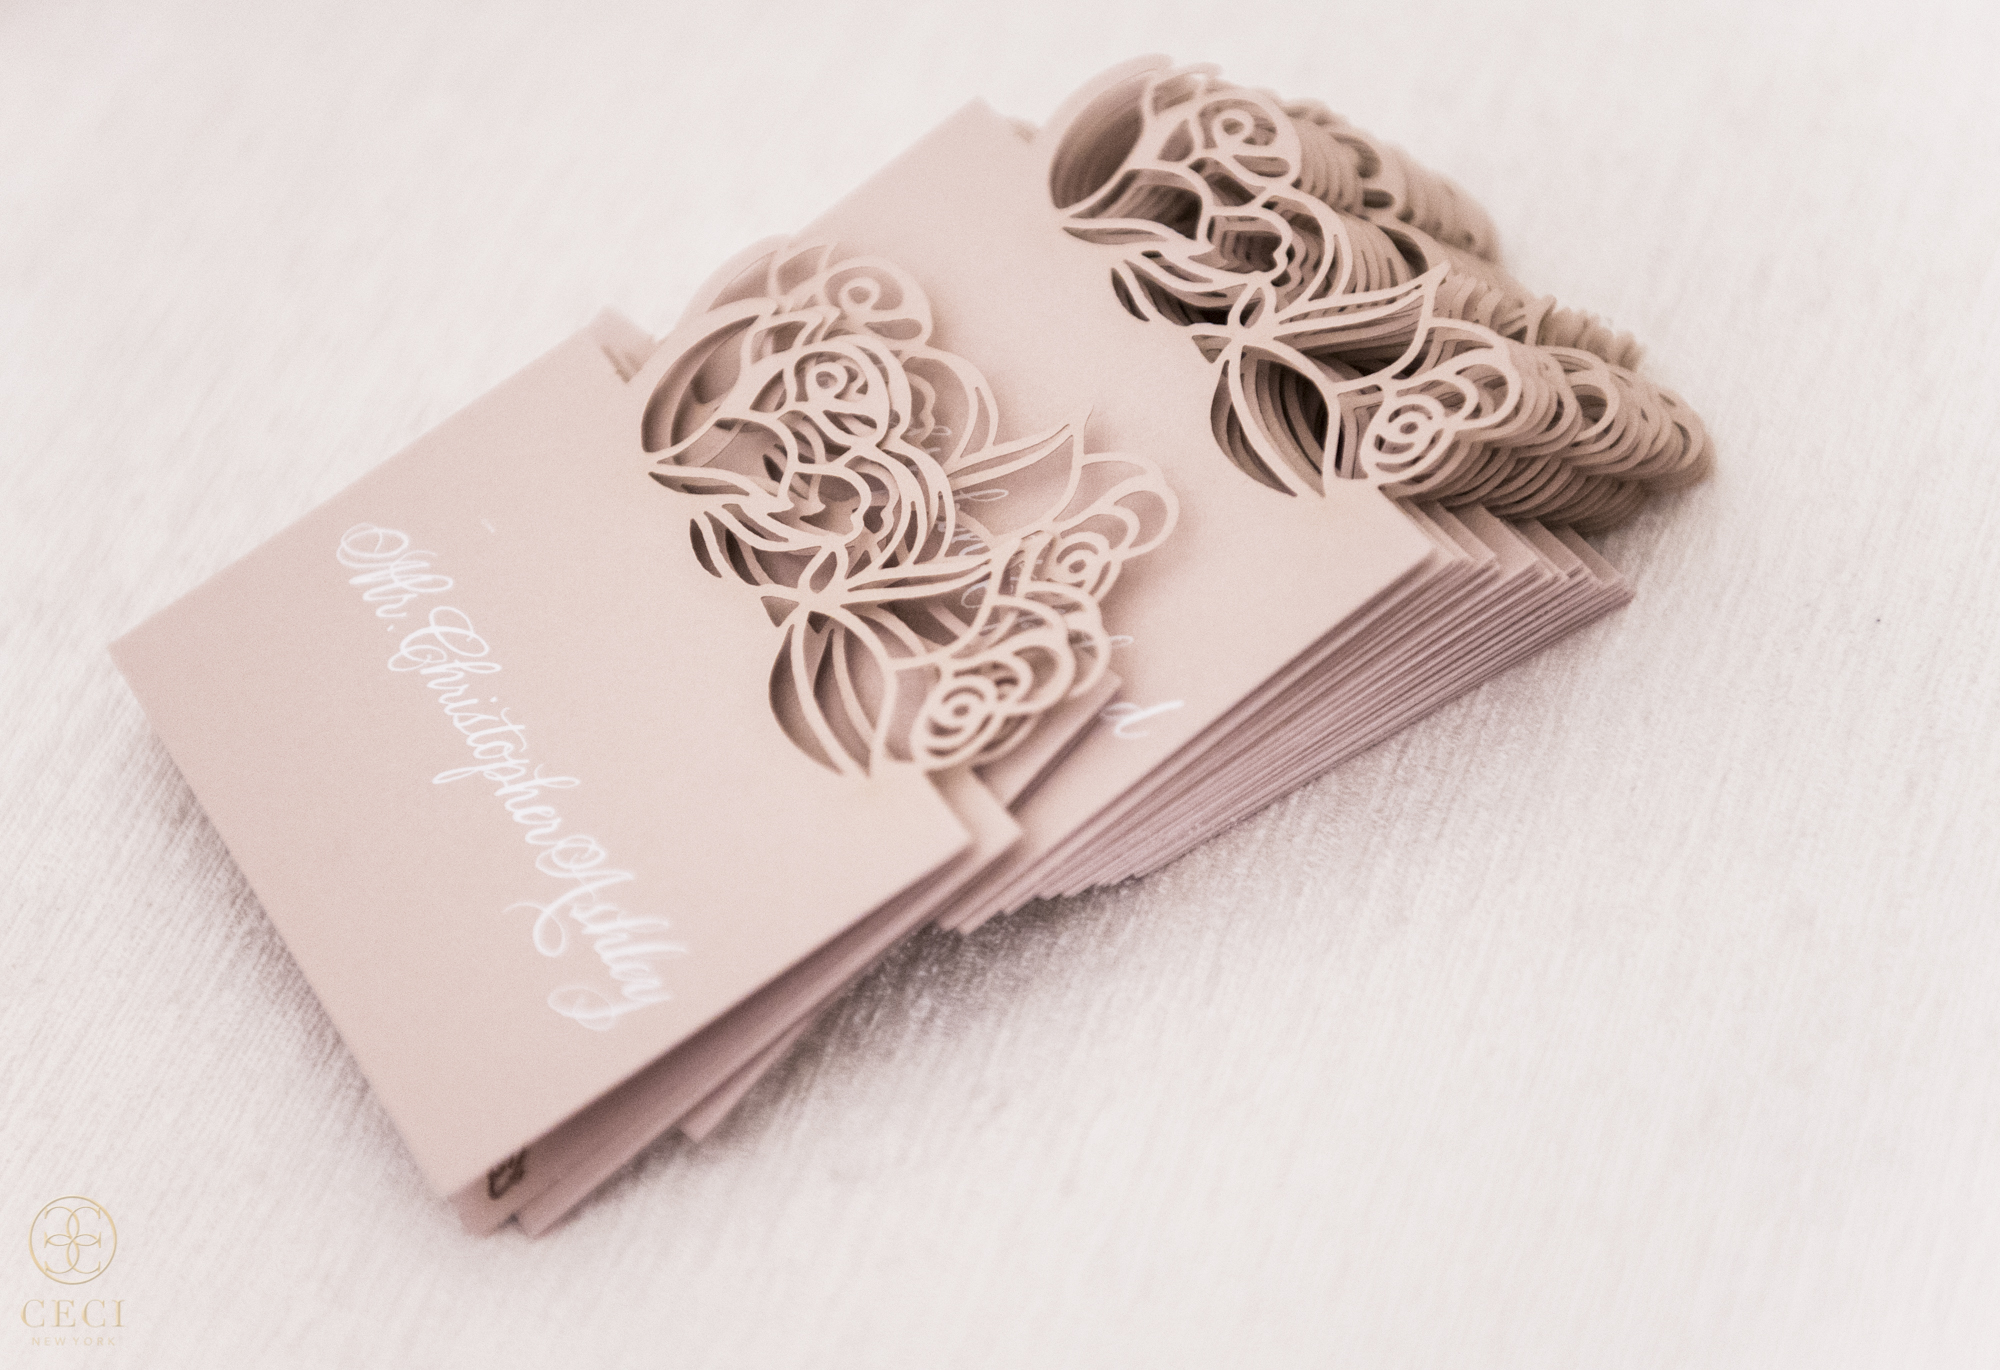 rose_gold_pink_romantic_real_wedding_roses_inspiration_cecinewyork_cecistyle_v152_1-7.jpg